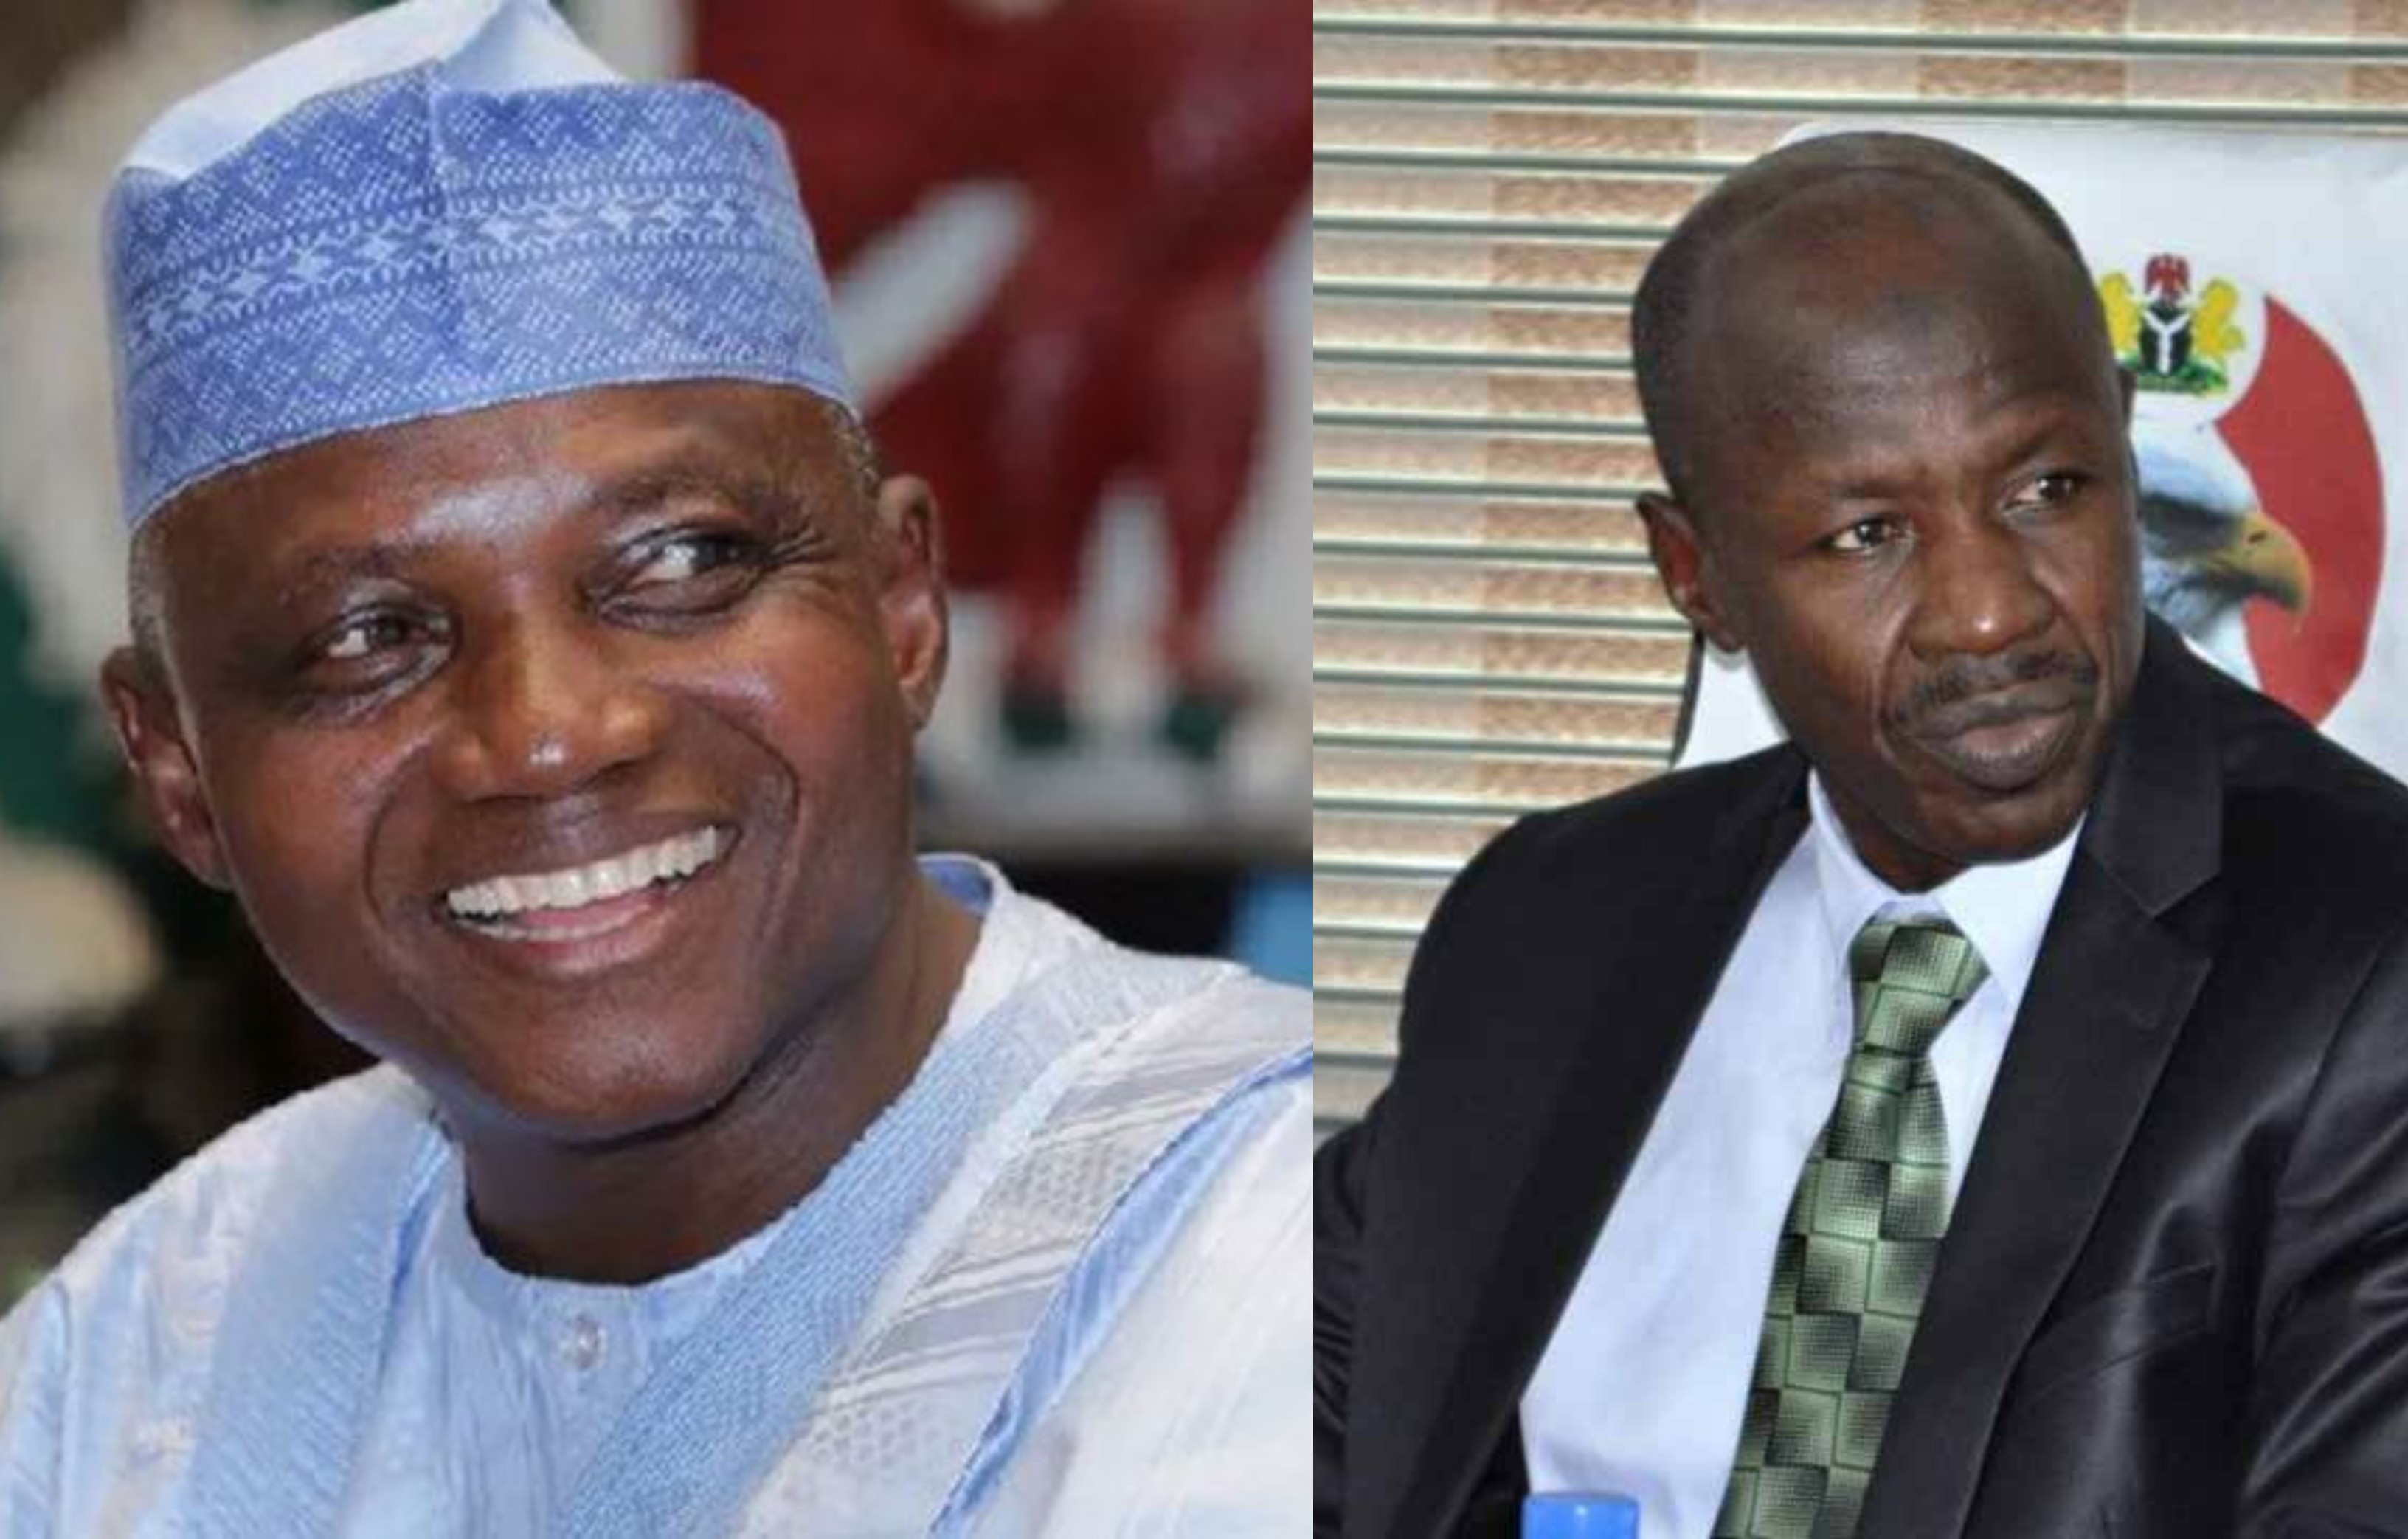 Expect surprises from Magus probe - Garba Shehu tells Nigerians lindaikejisblog